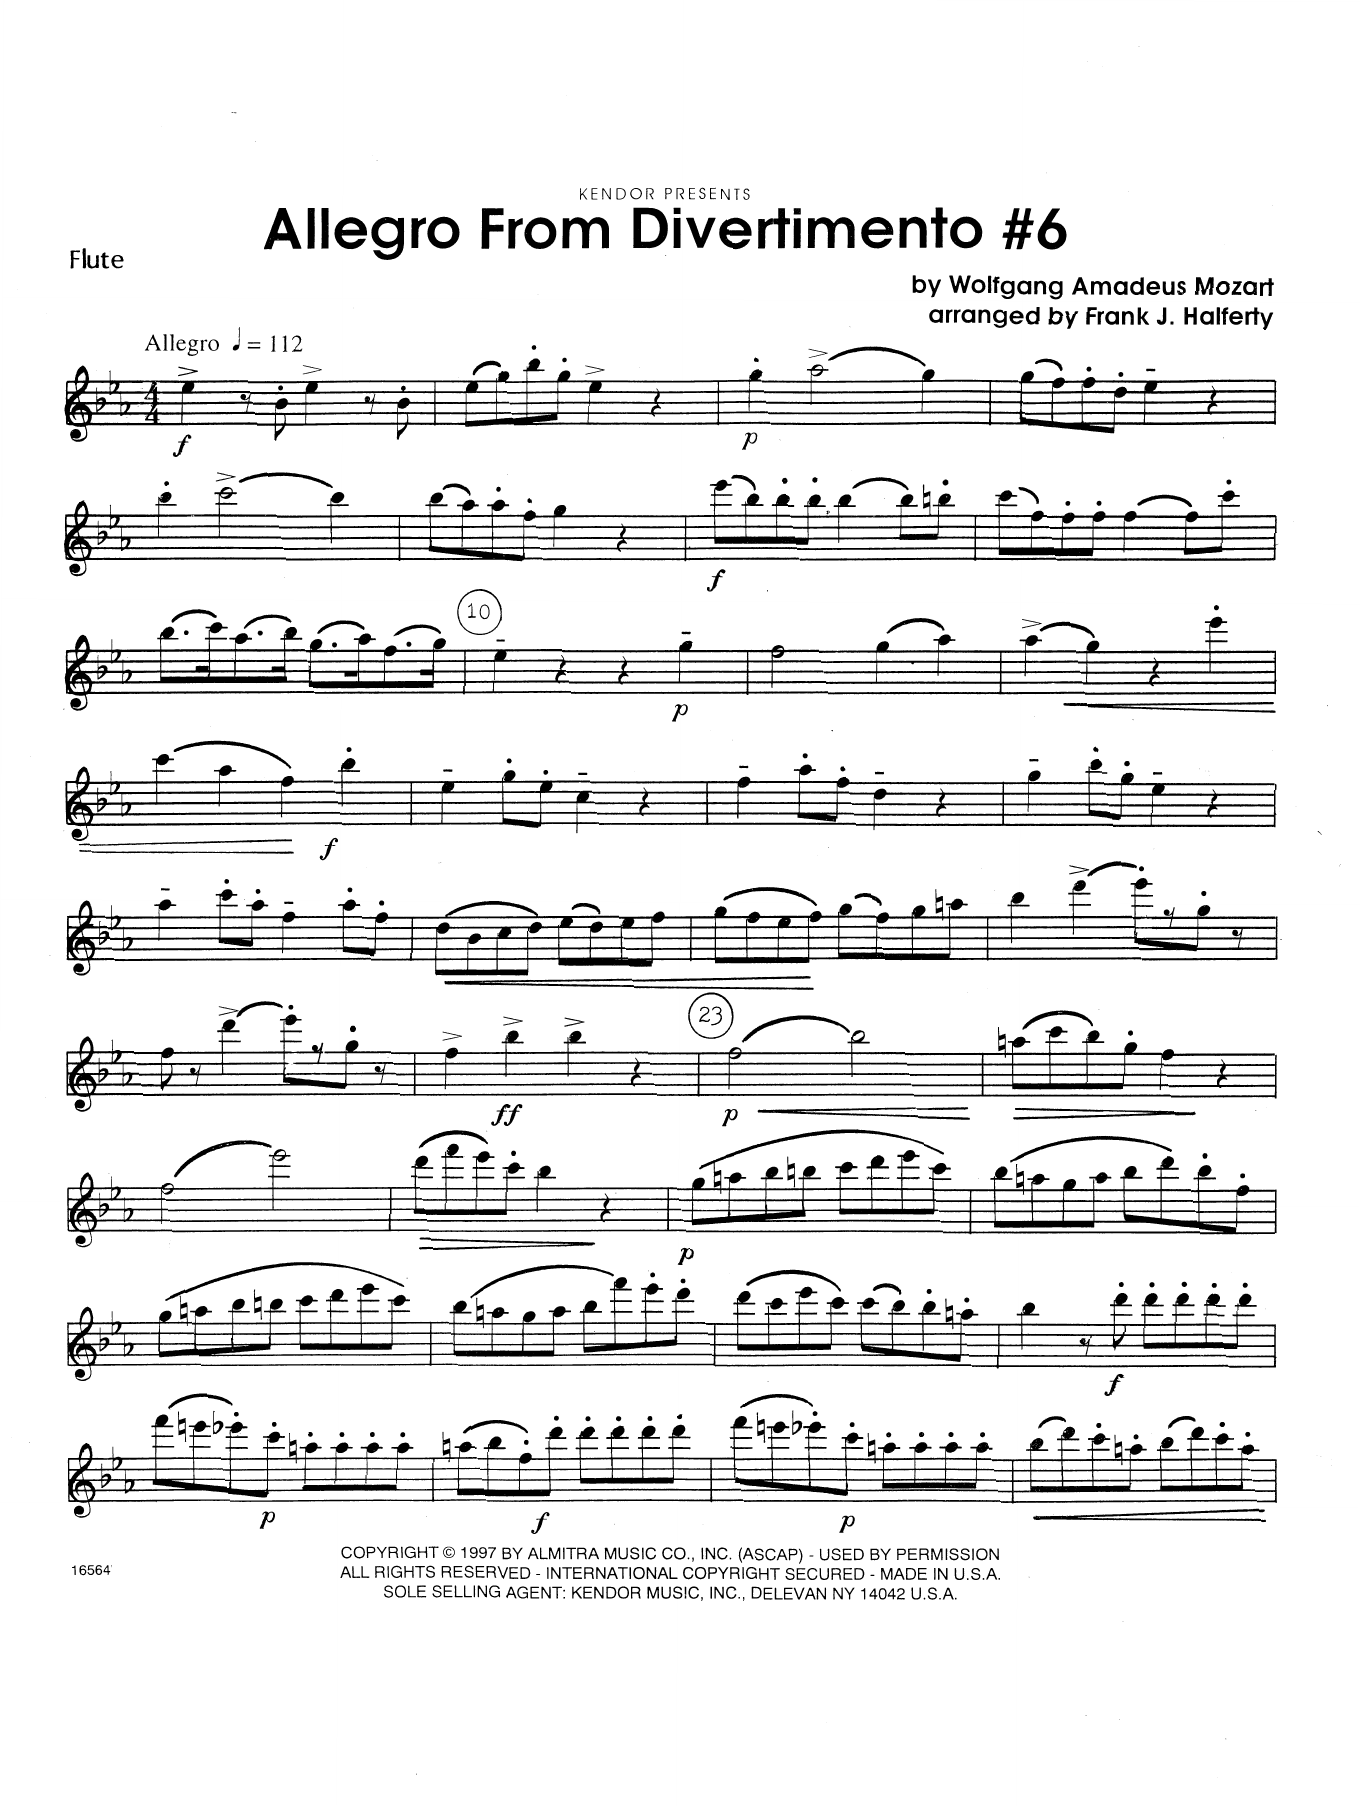 Allegro From Divertimento #6 (arr. Frank Halferty) - Flute Sheet Music